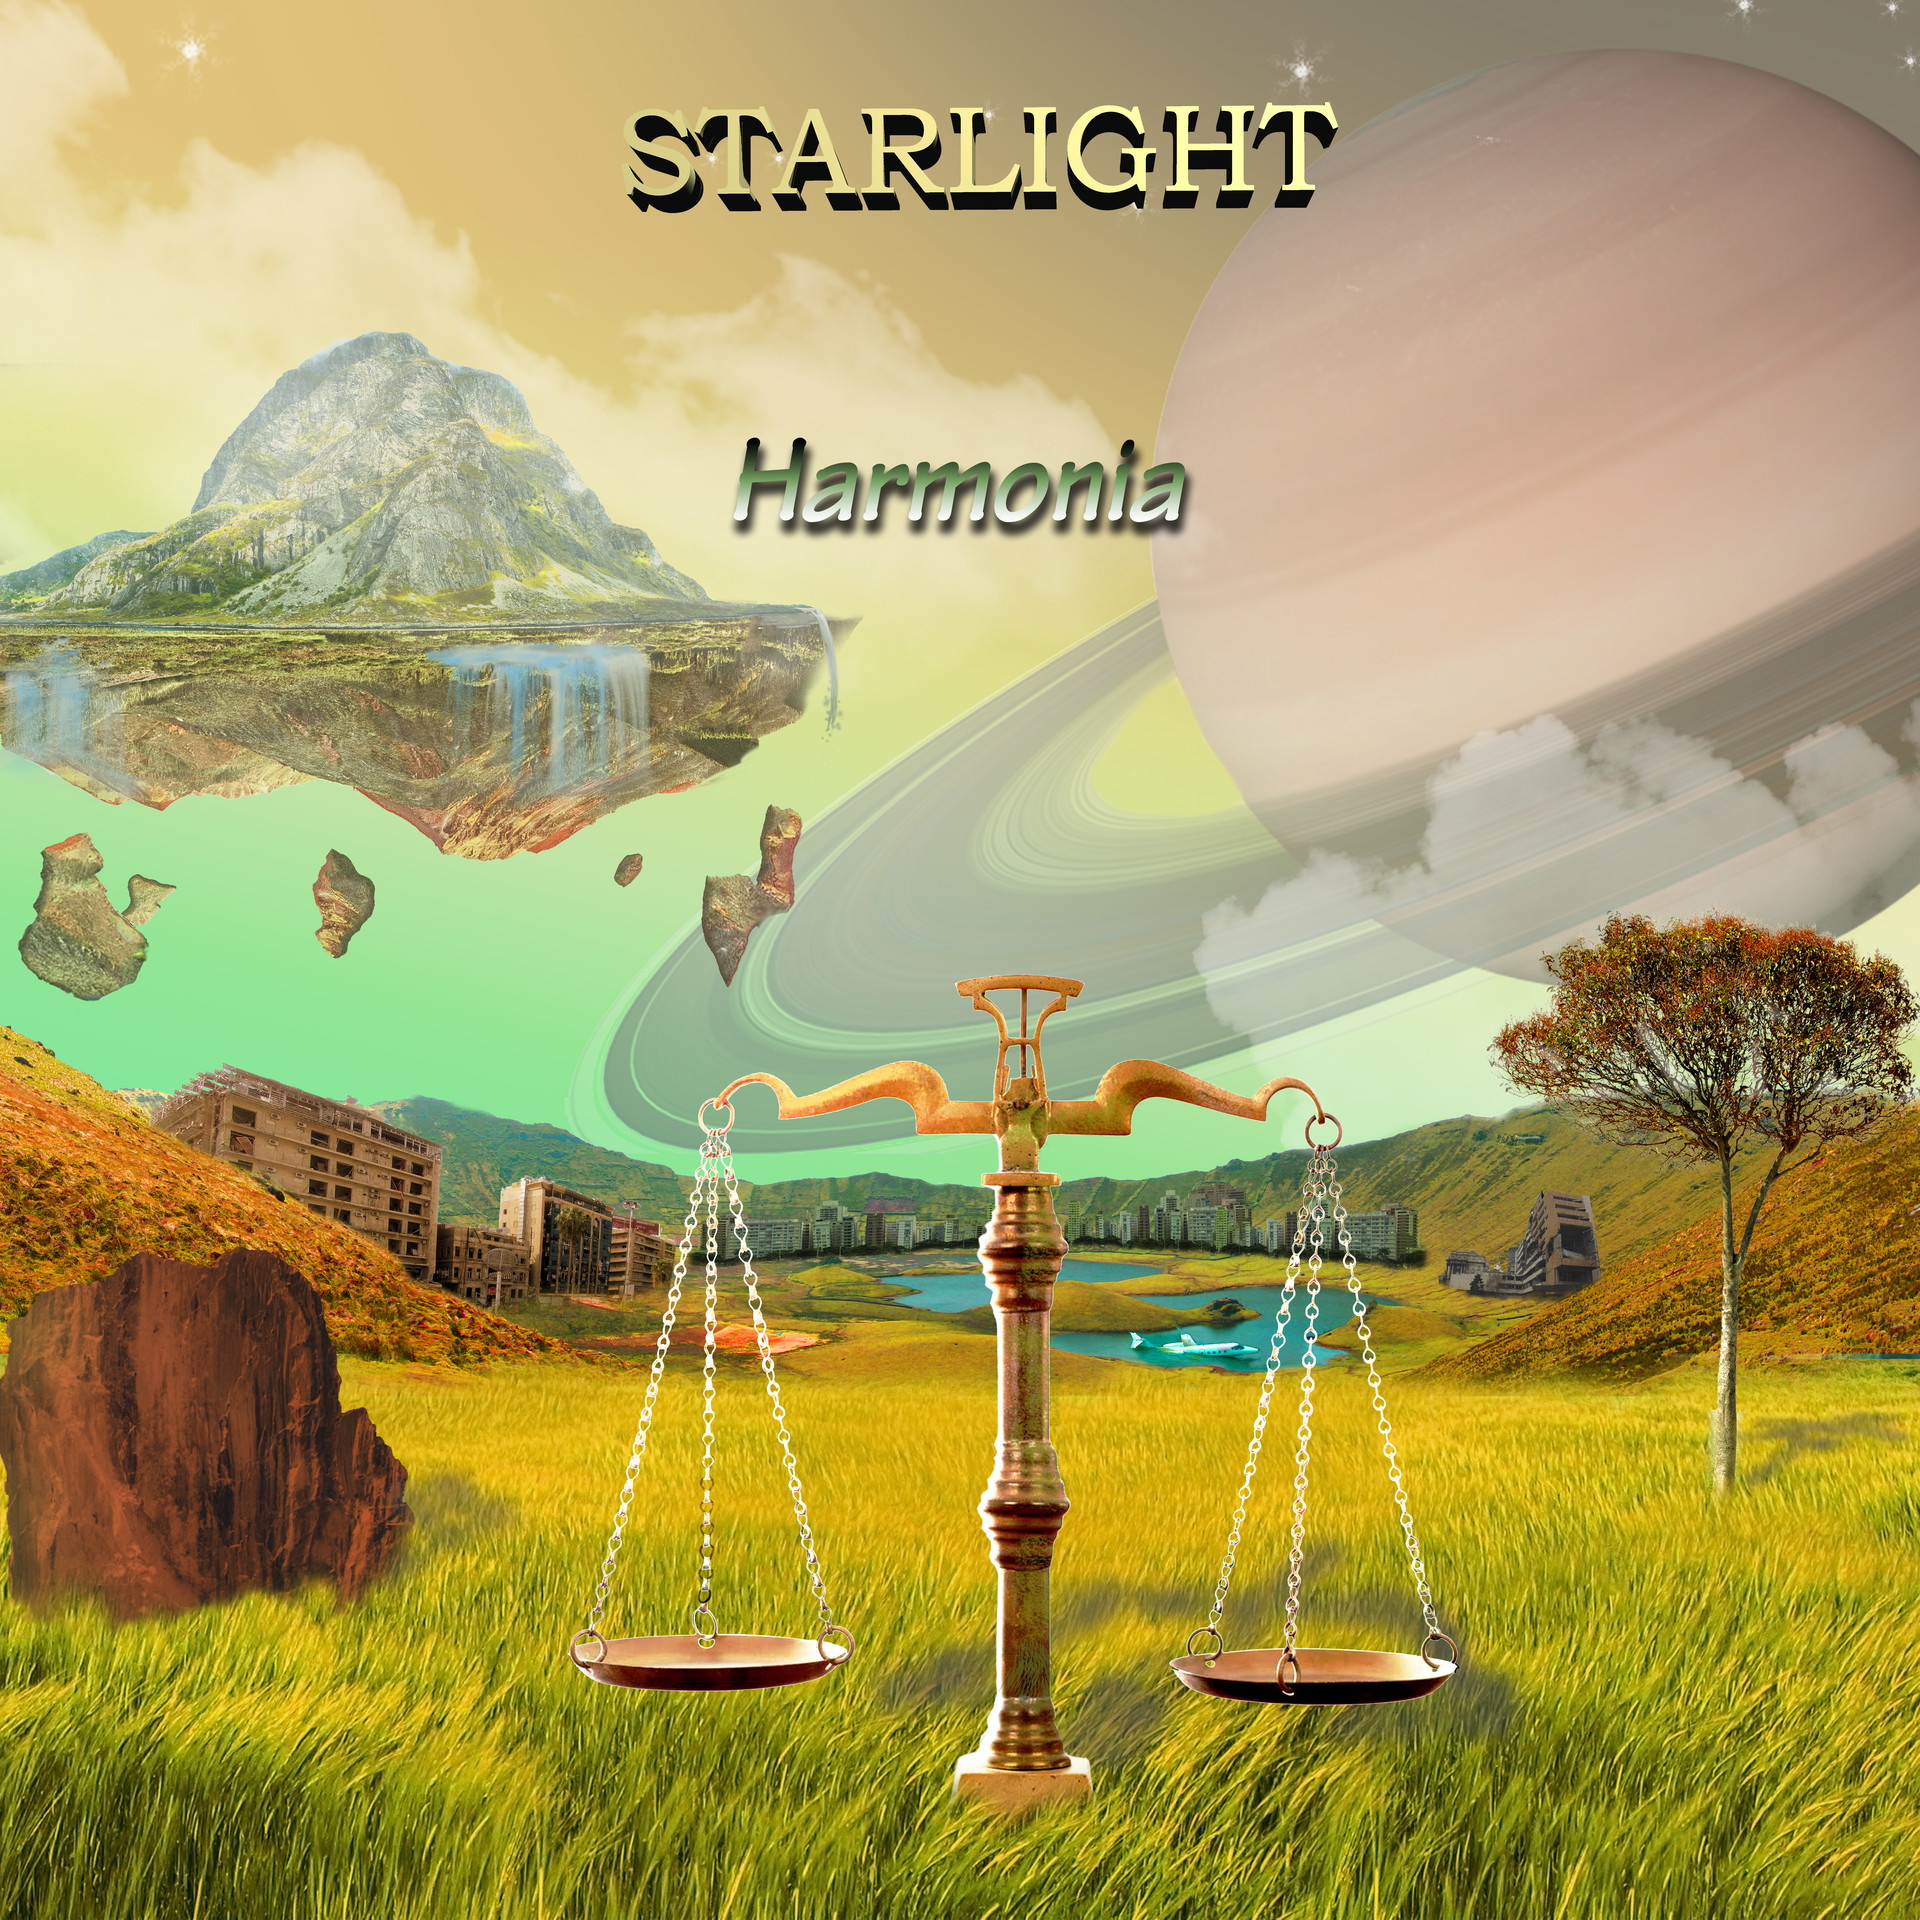 Jonathan Álex - Starlight band - Official Cover